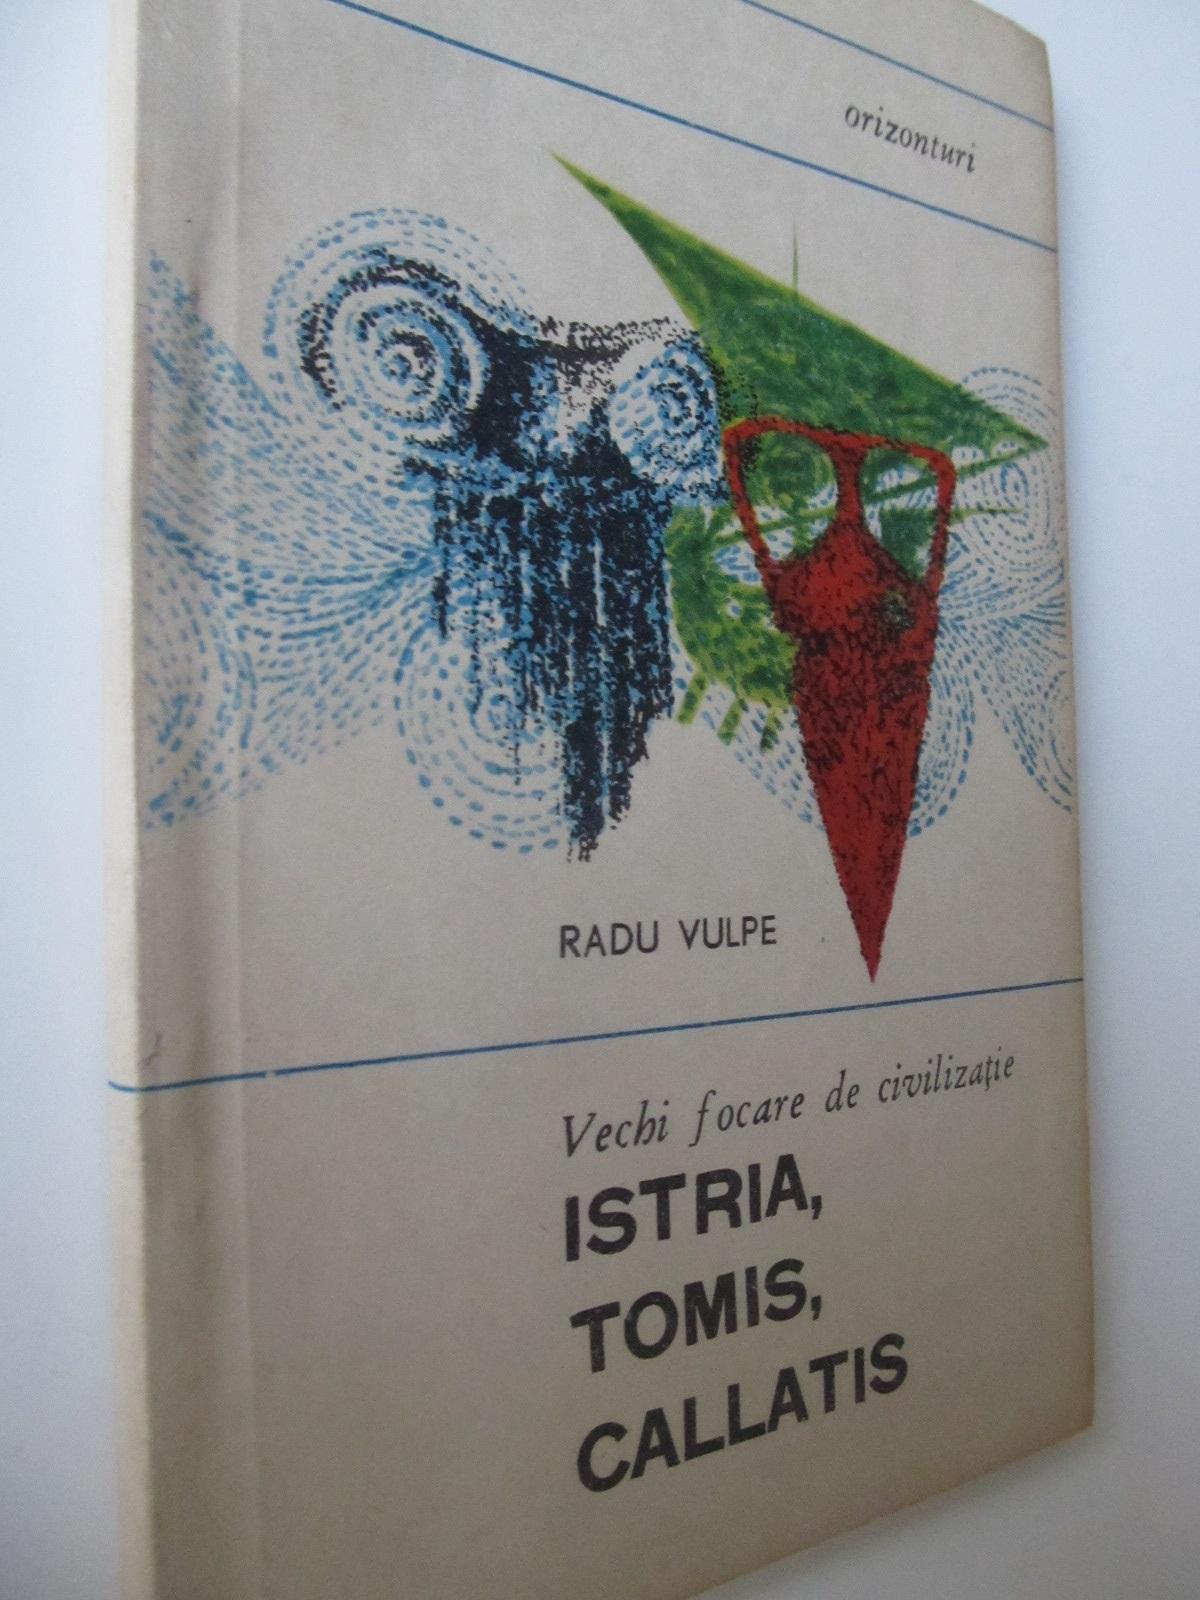 Vechi focare de civilizatie Istria Tomis Callatis - Radu Vulpe | Detalii carte